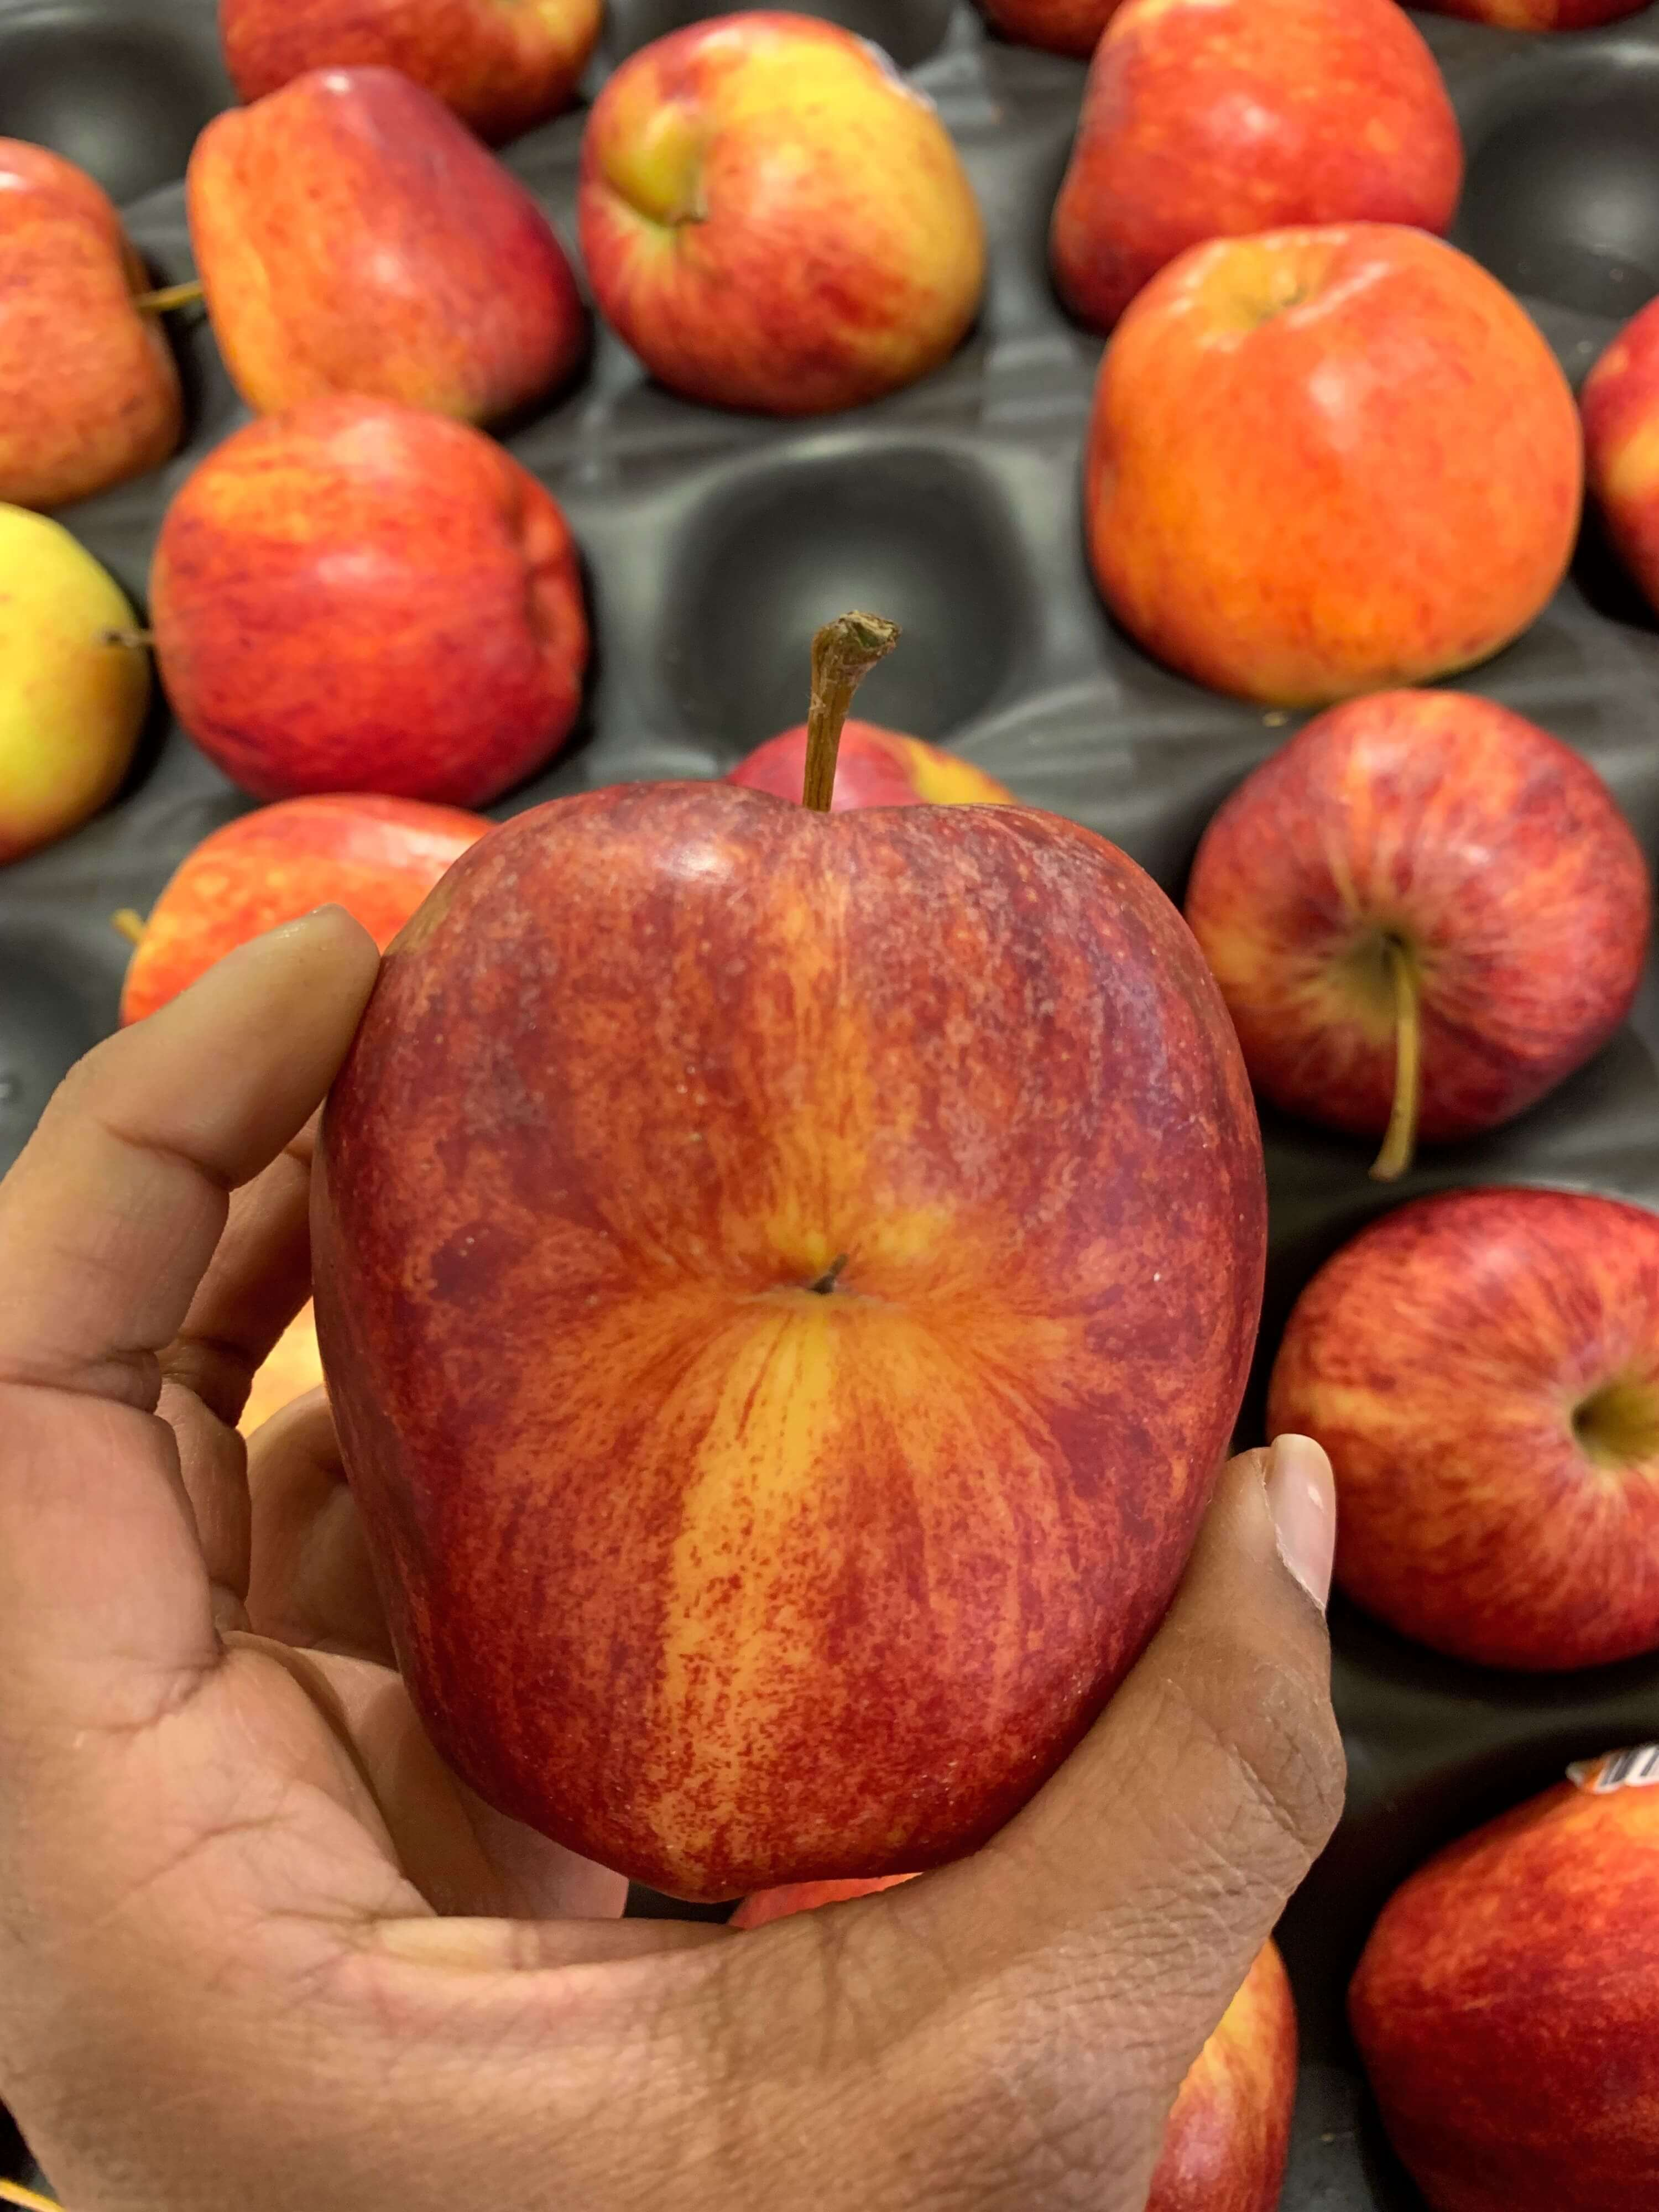 closeup photo of a disfigured red gala apple